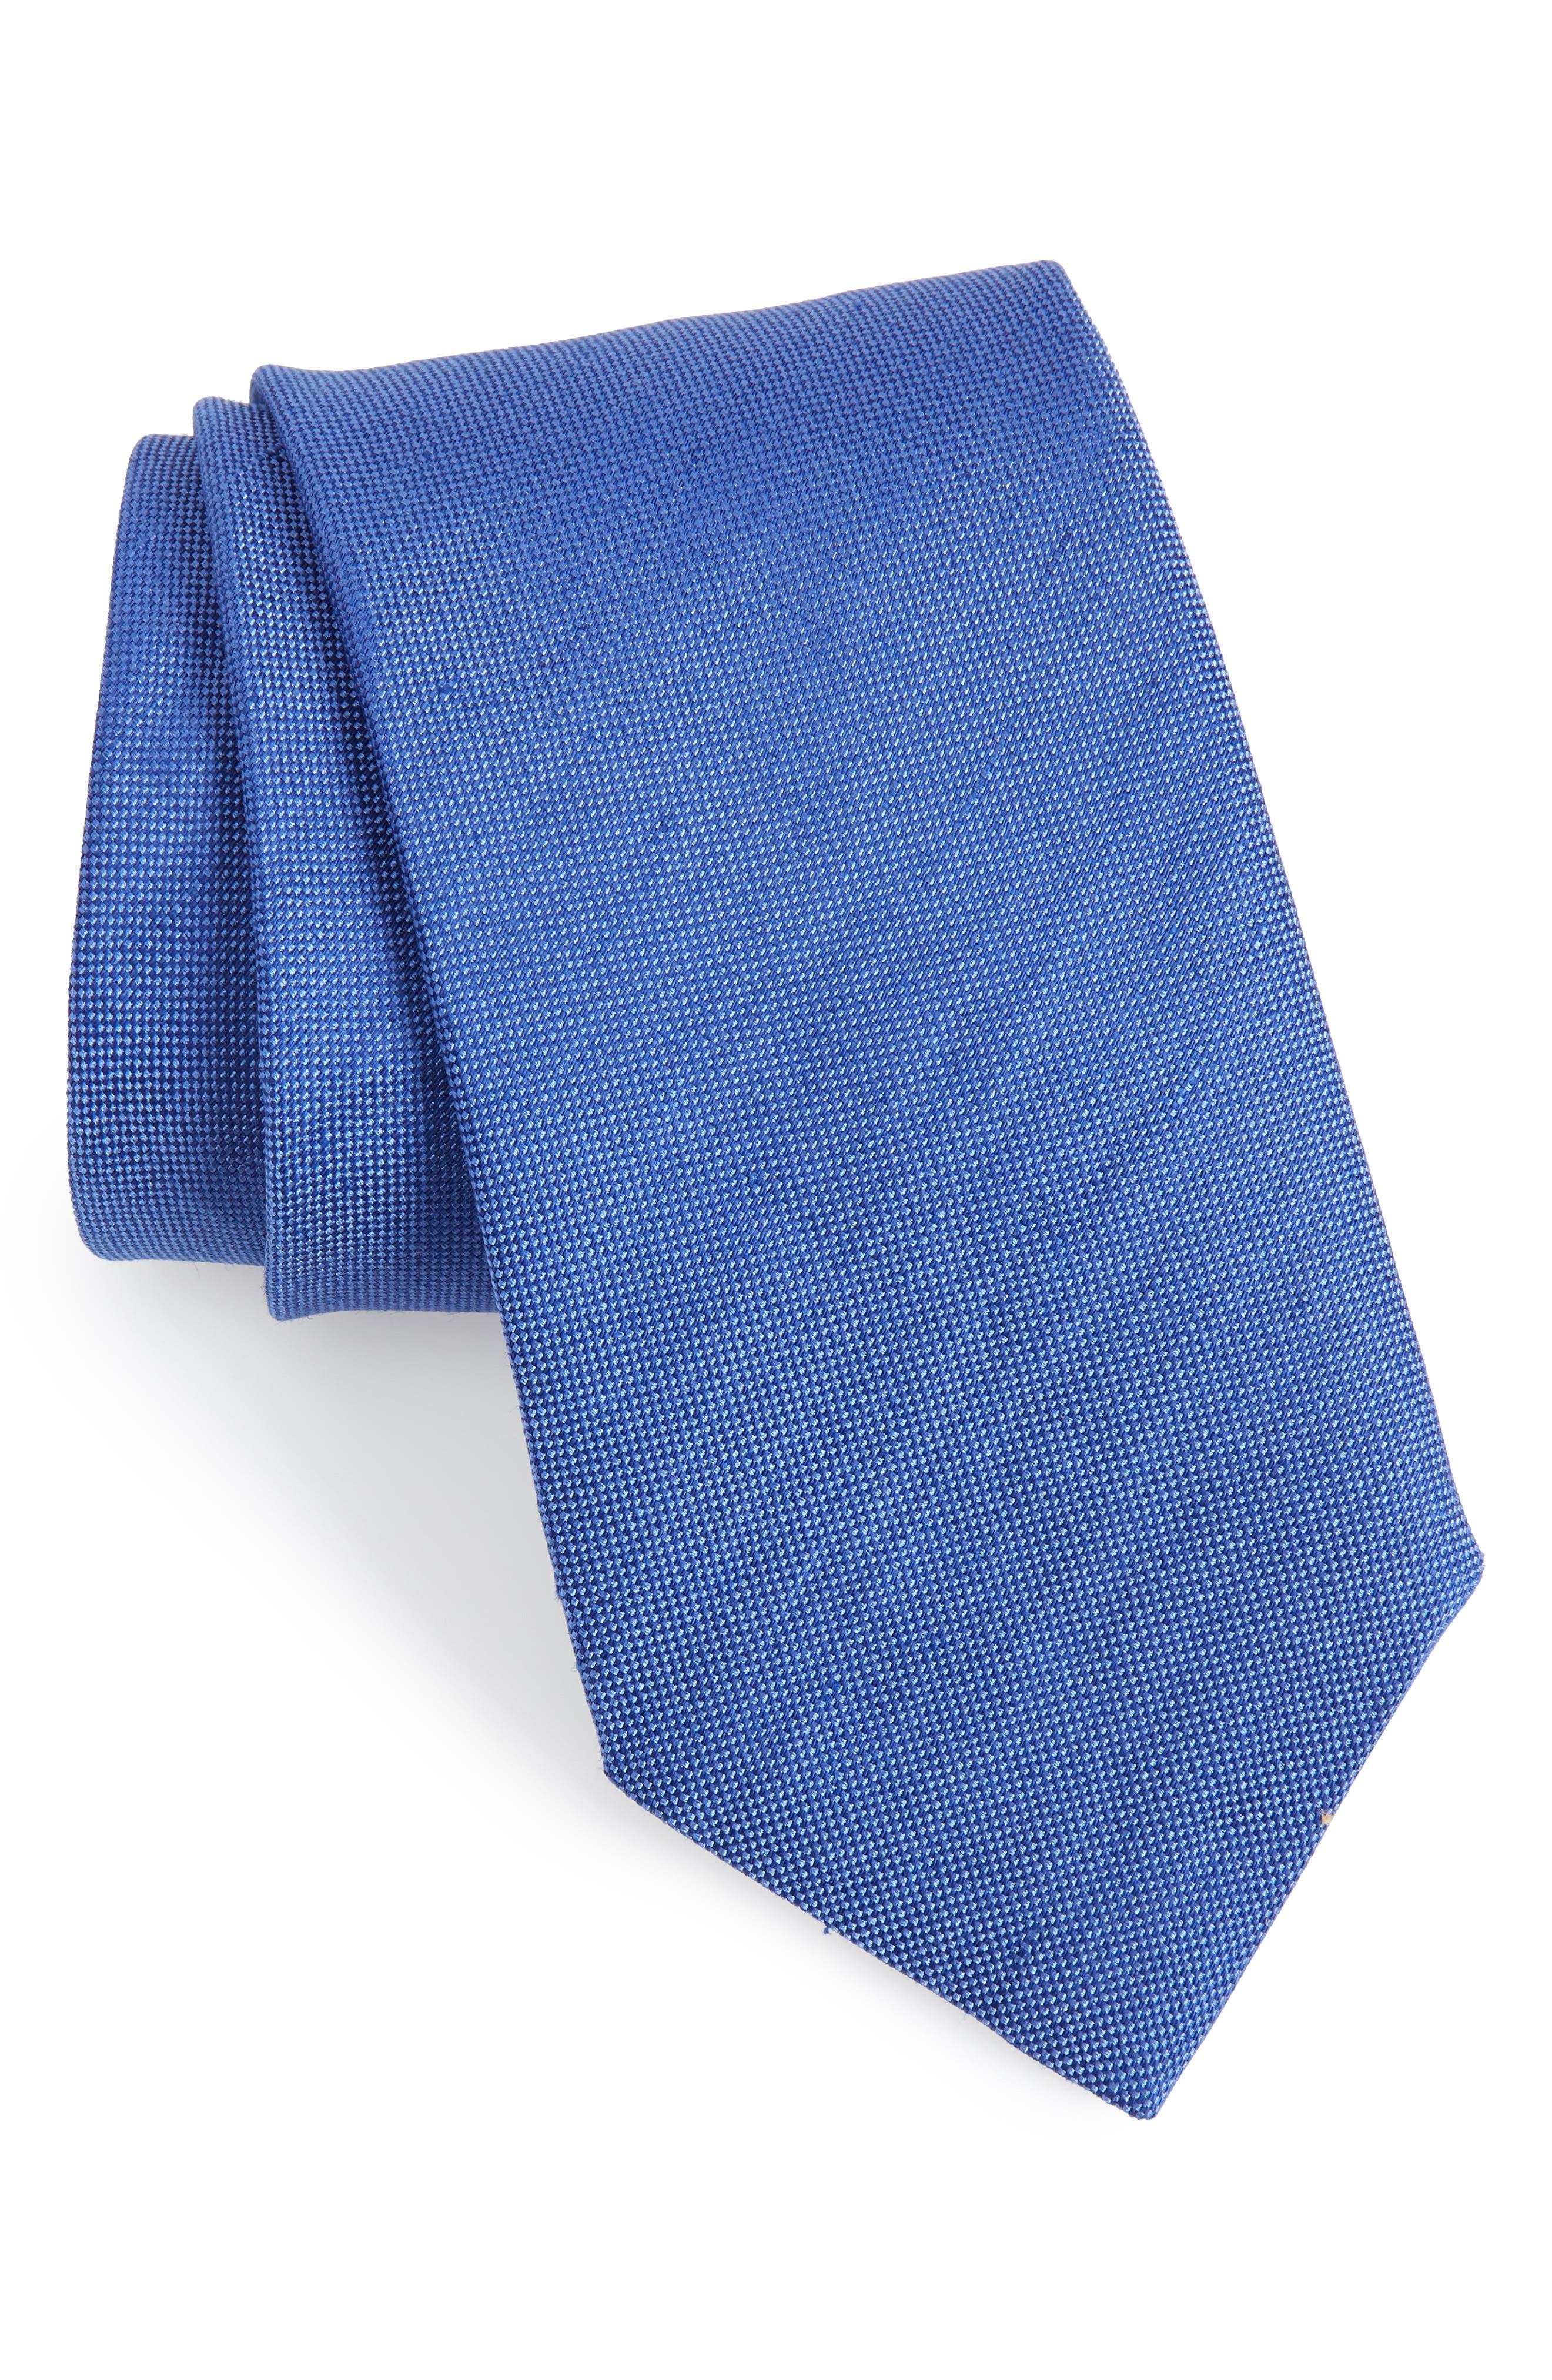 Solid Linen & Silk Tie,                             Main thumbnail 1, color,                             423